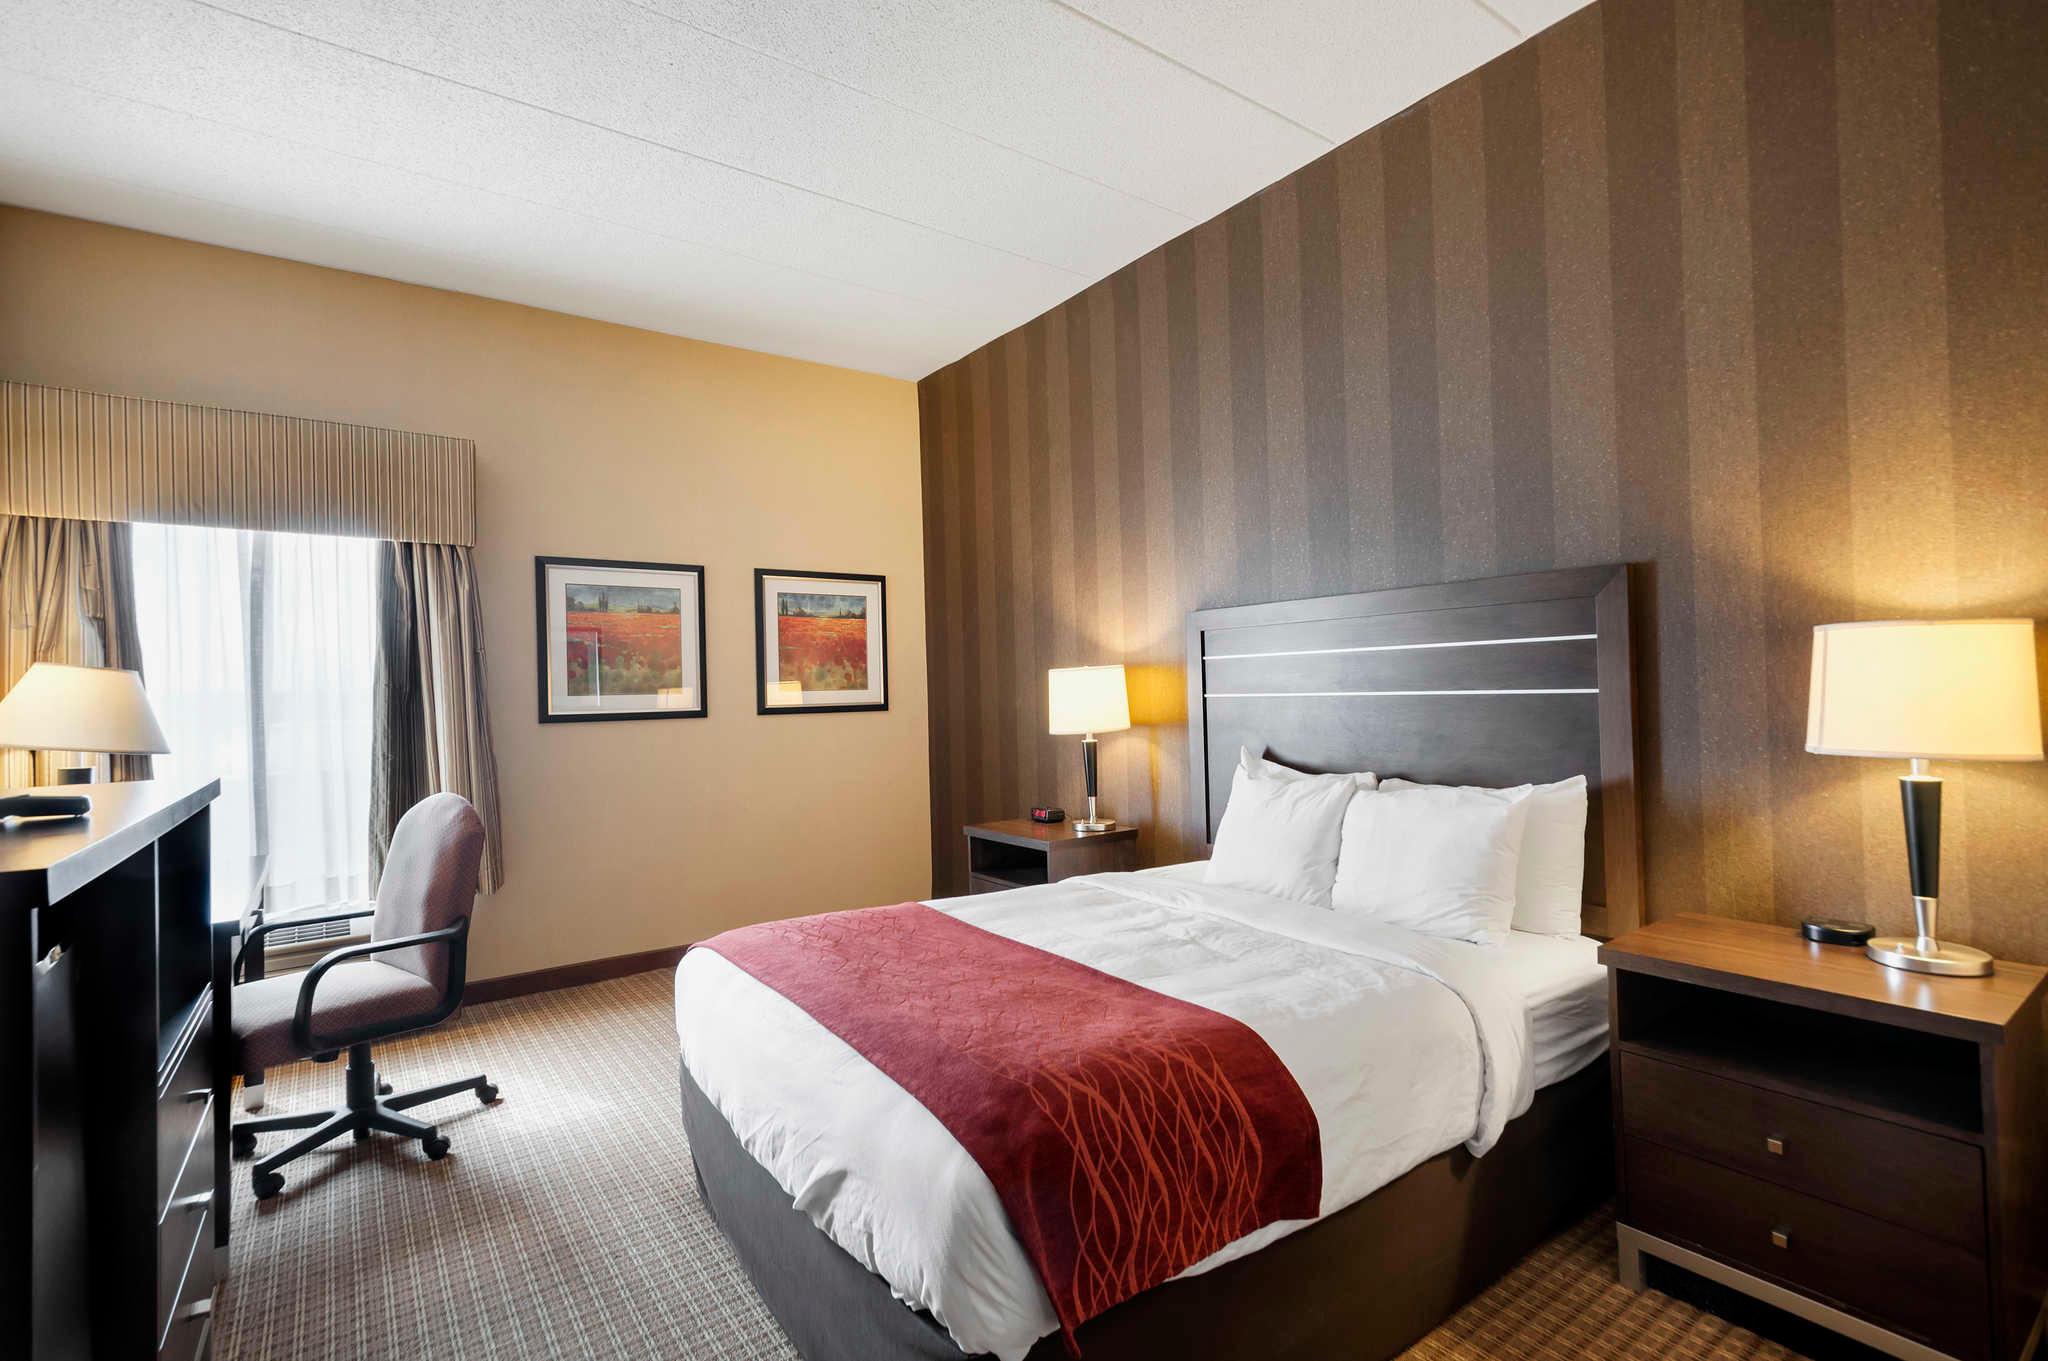 Comfort Inn & Suites Edgewood - Aberdeen image 0